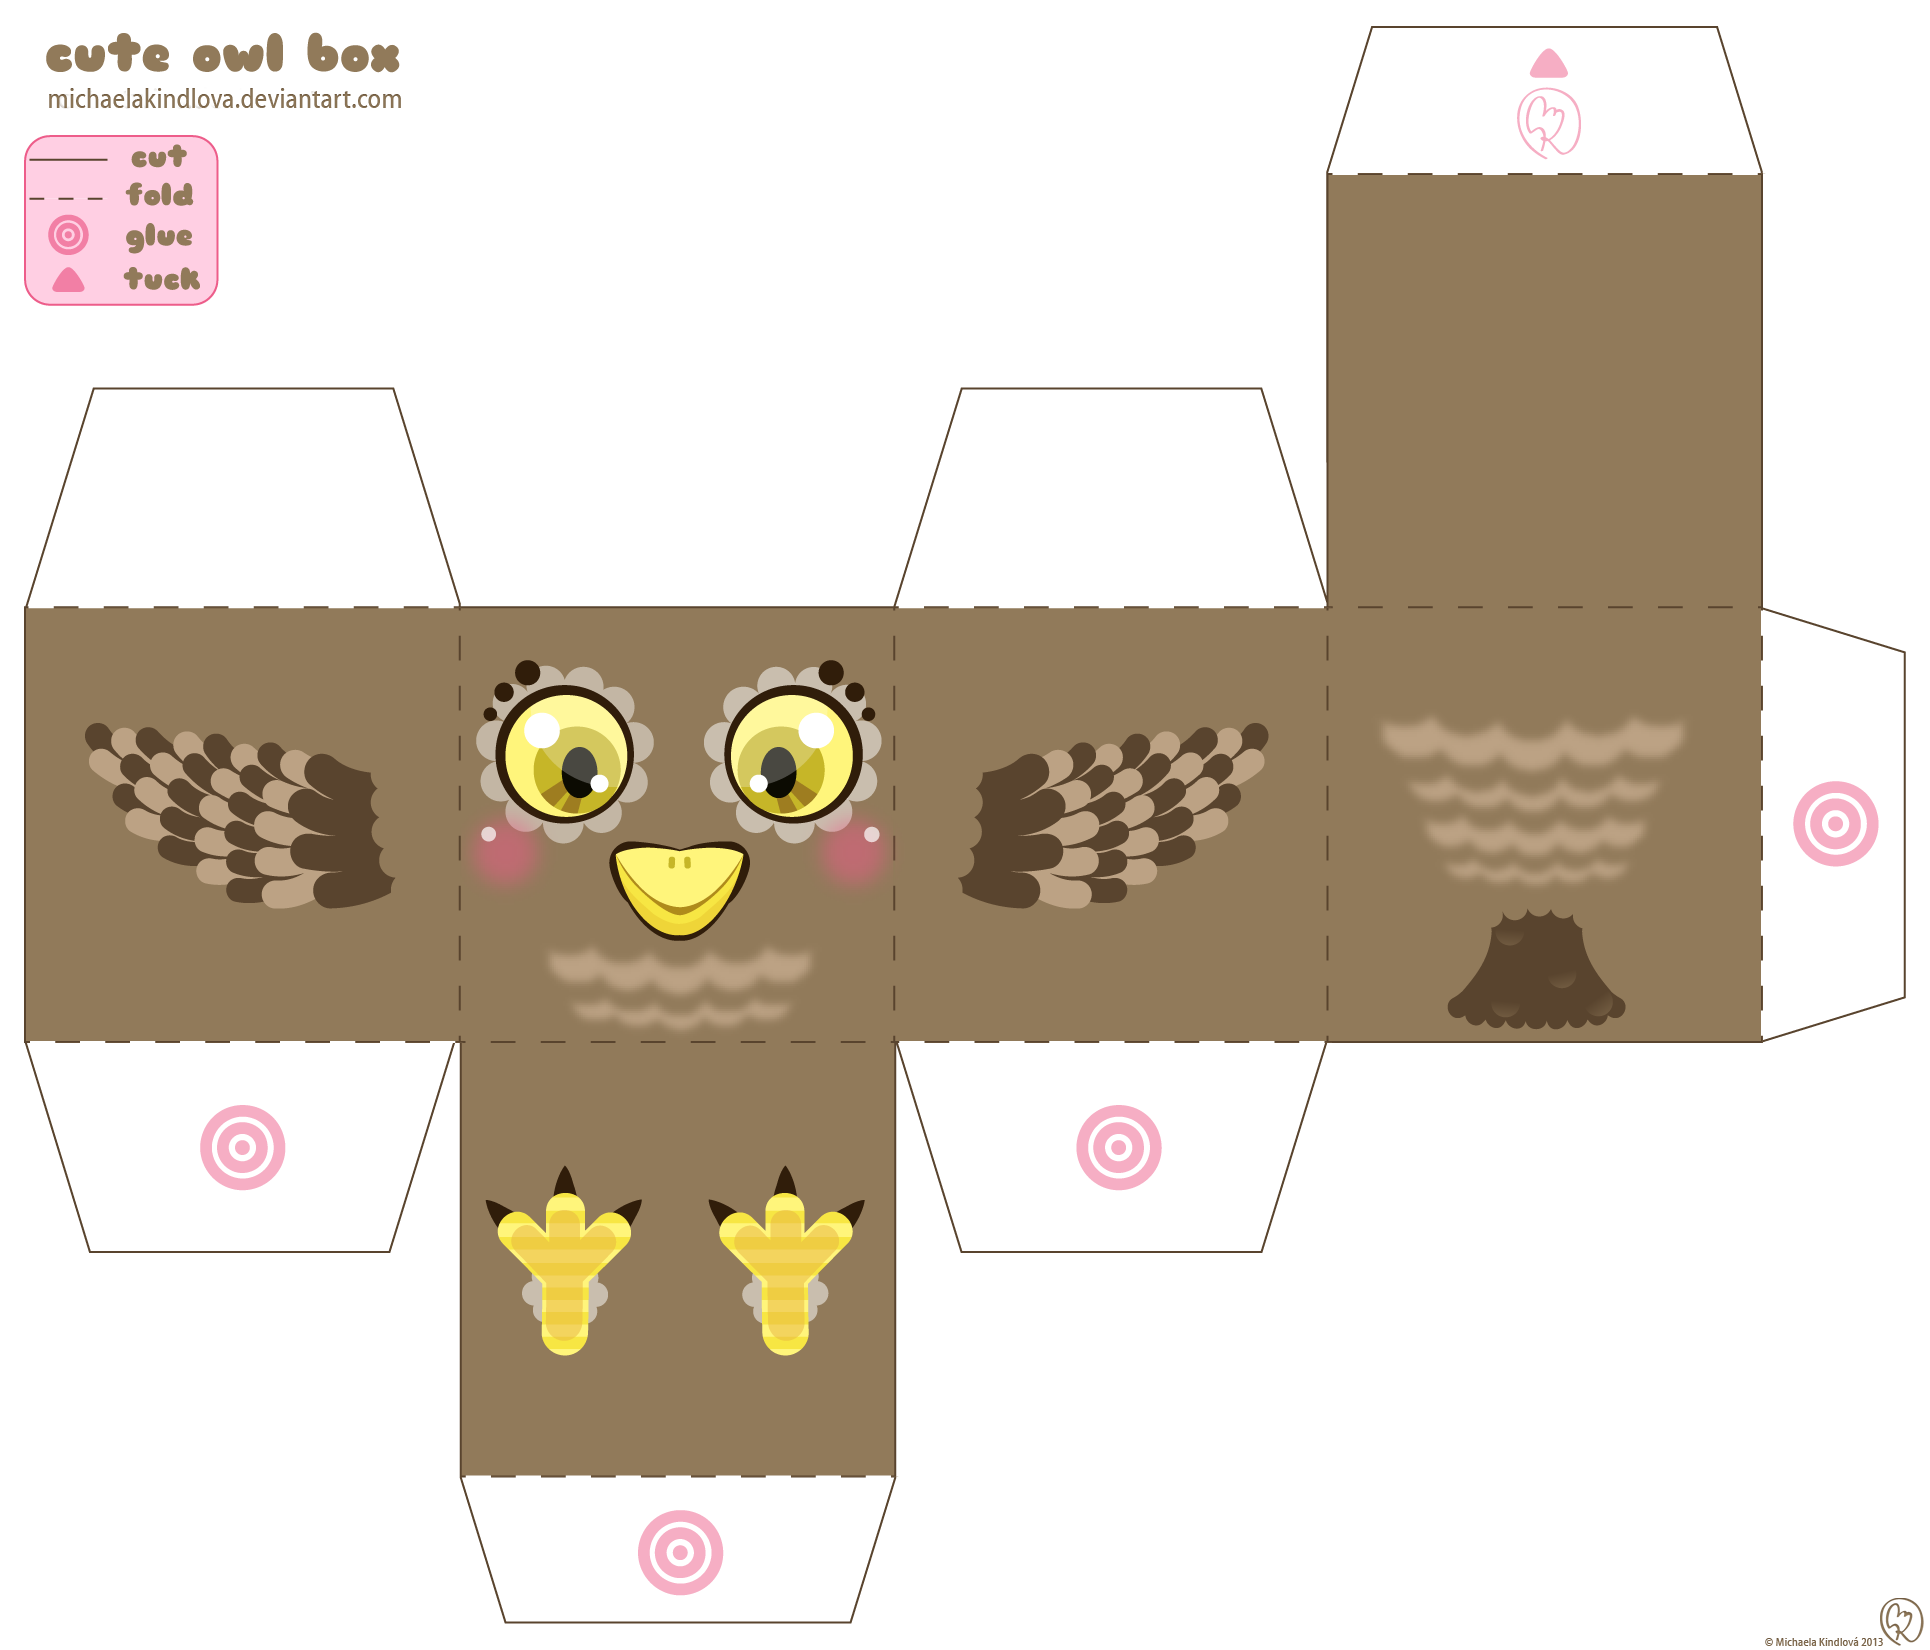 Cute paper craft images craft decoration ideas owl paper craft choice image craft decoration ideas cute paper craft choice image craft decoration ideas jeuxipadfo Choice Image